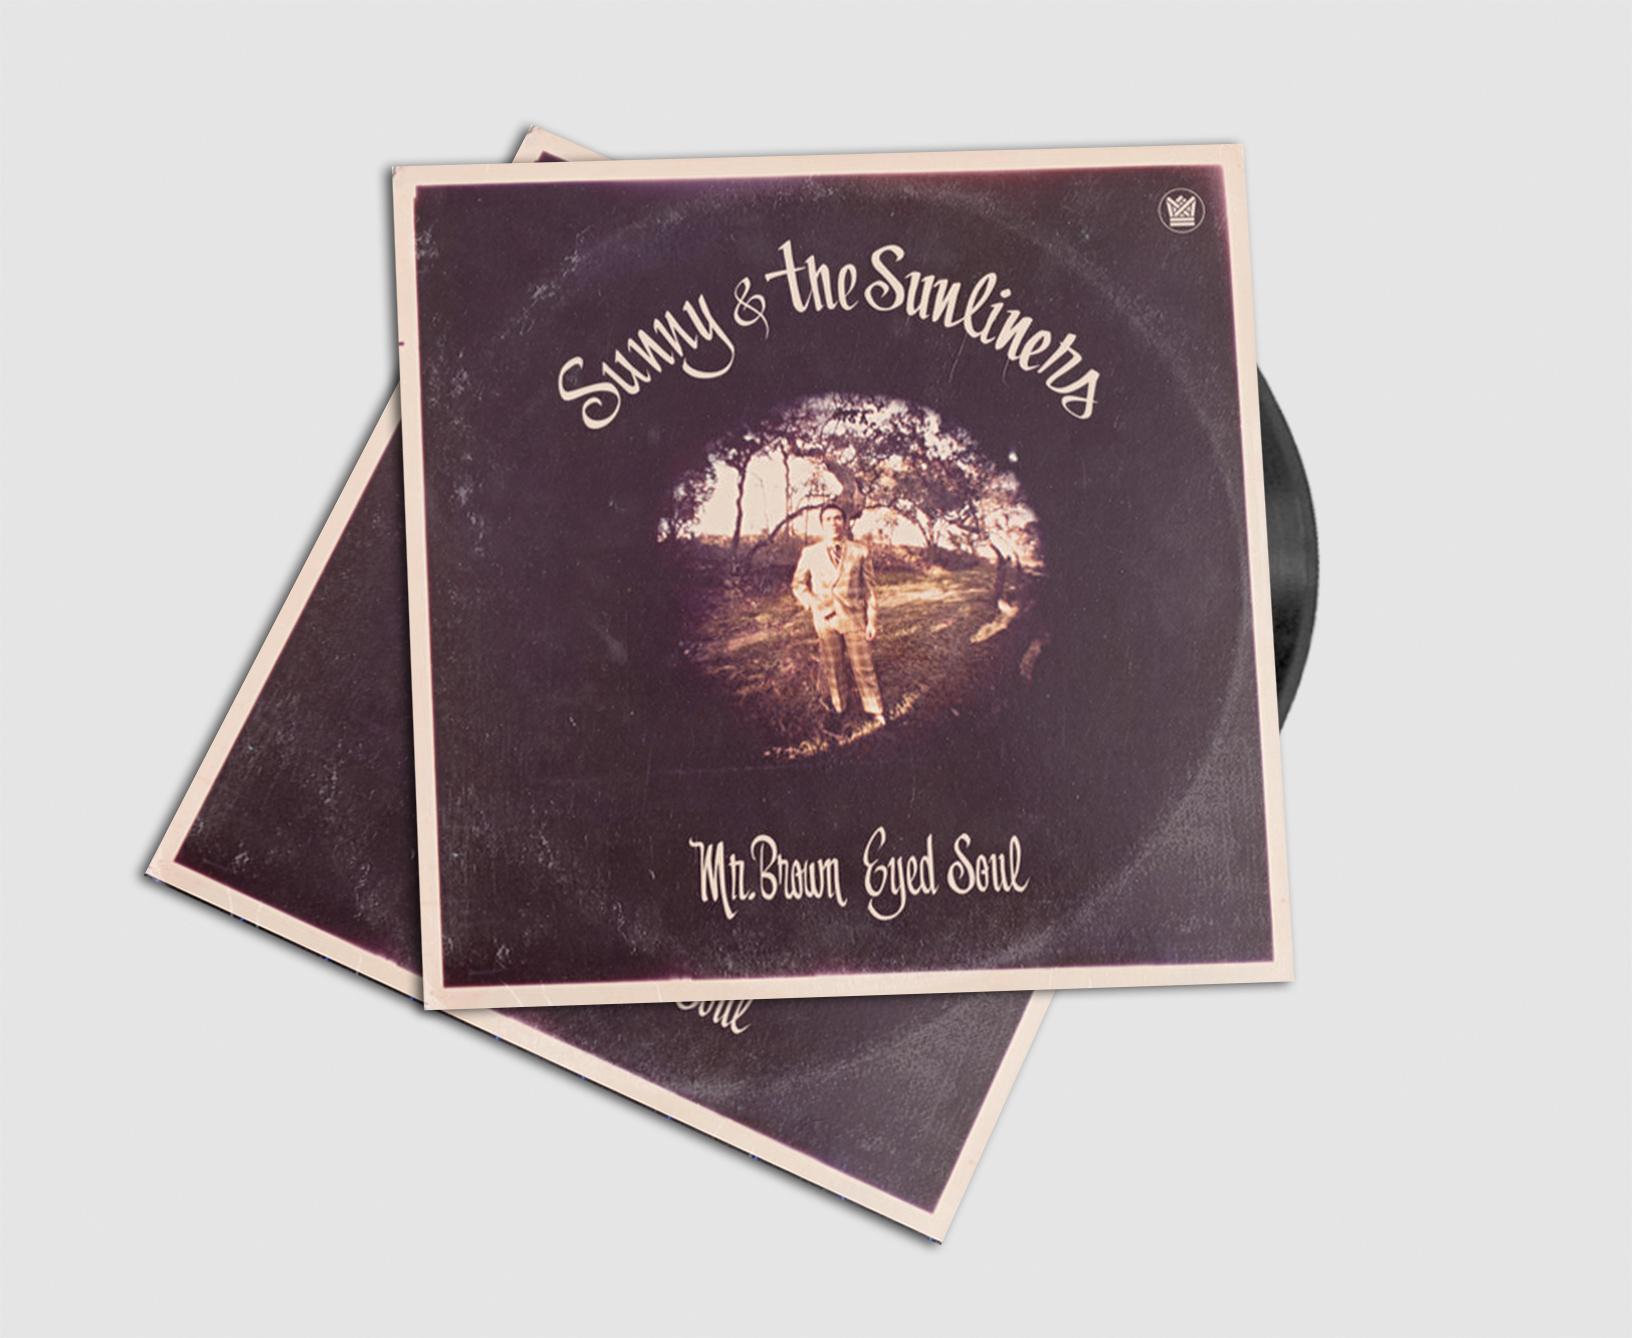 Big Crown records приоткроет дверь в мексиканский соул 60-х в компиляции Sunny And The Sunliners «Mr. Brown Eyed Soul»